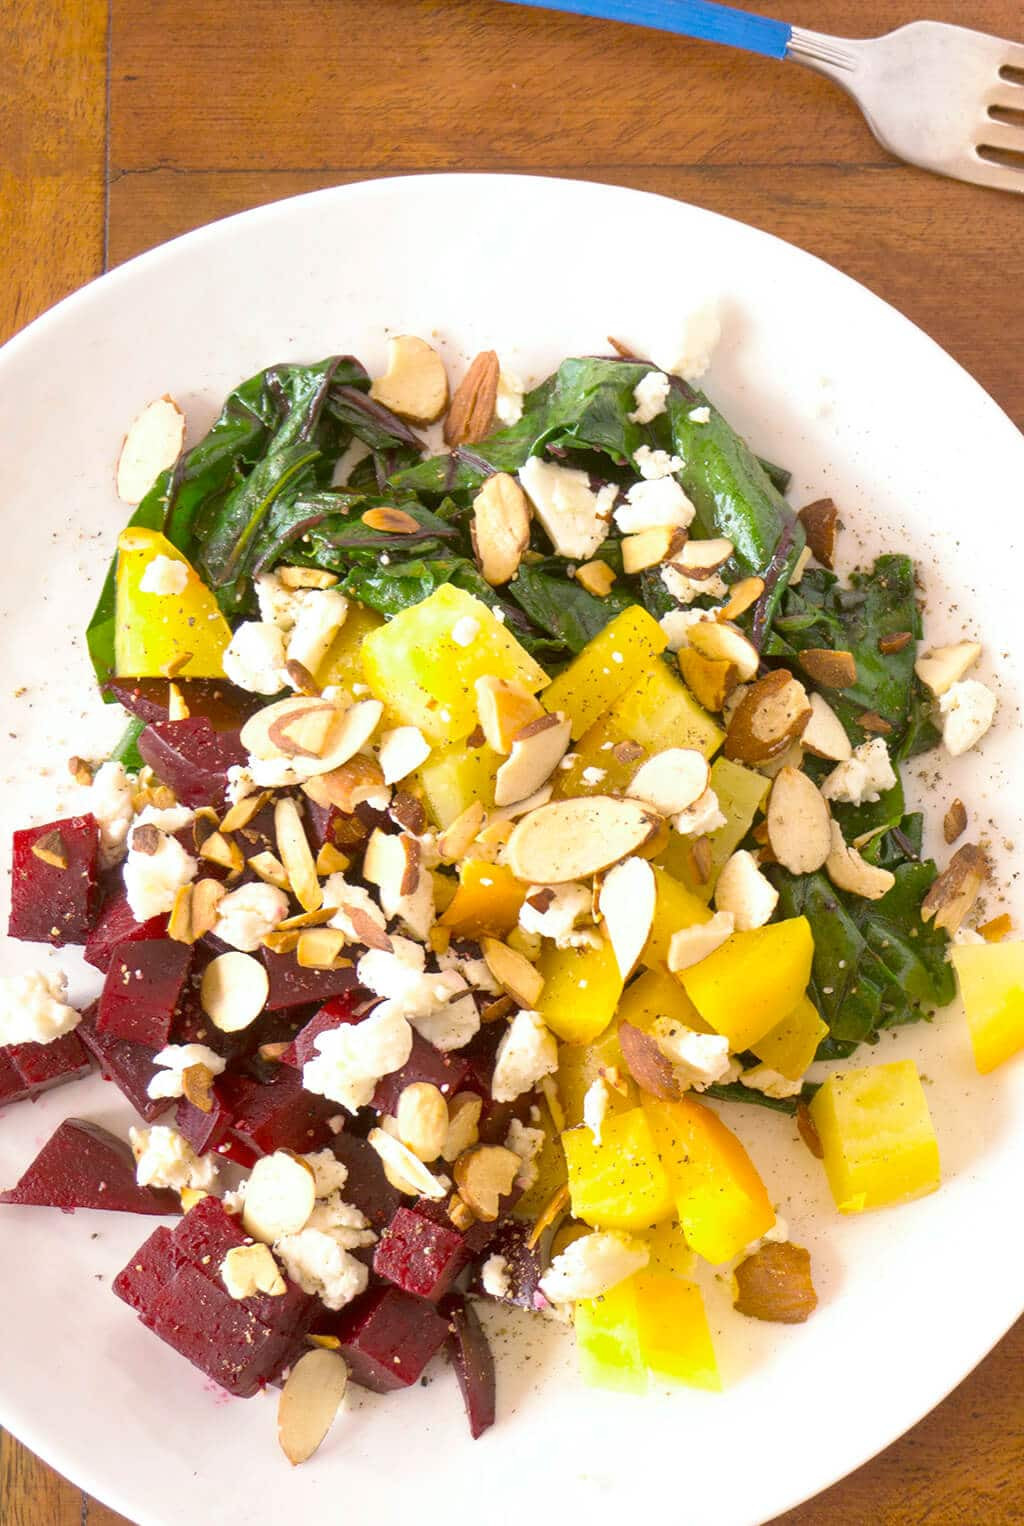 Beet Greens Salad  Warm Beets & Greens Salad Oat&Sesame